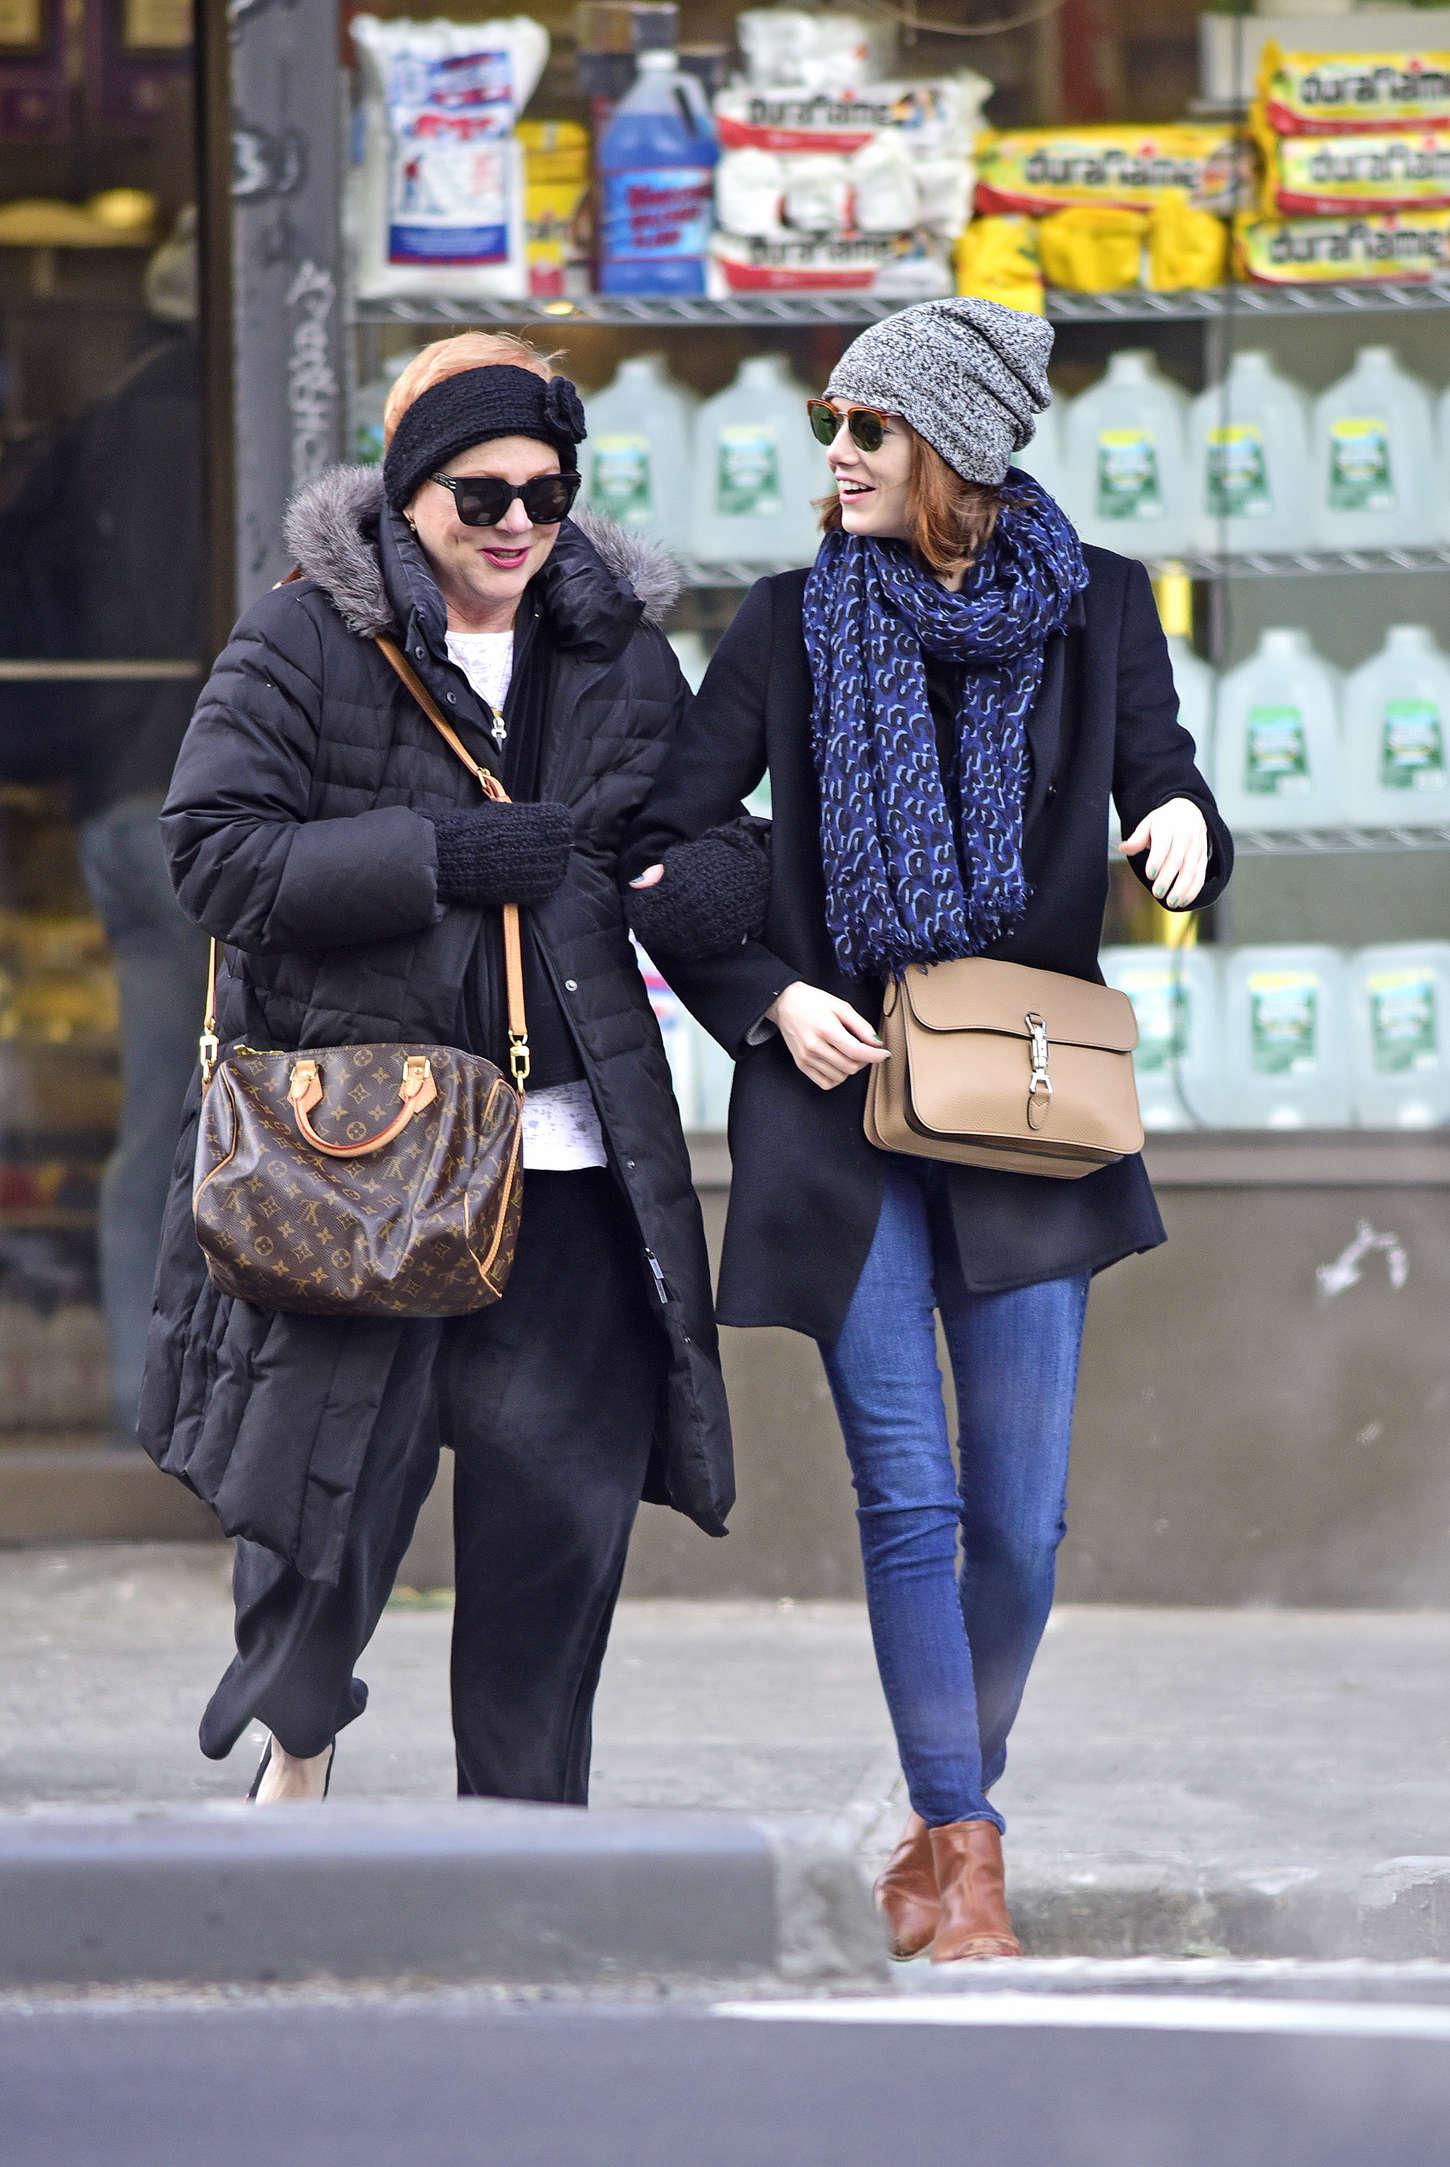 Emma Stone Street Style Out In New York City Celebrity Wiki Onceleb Wiki